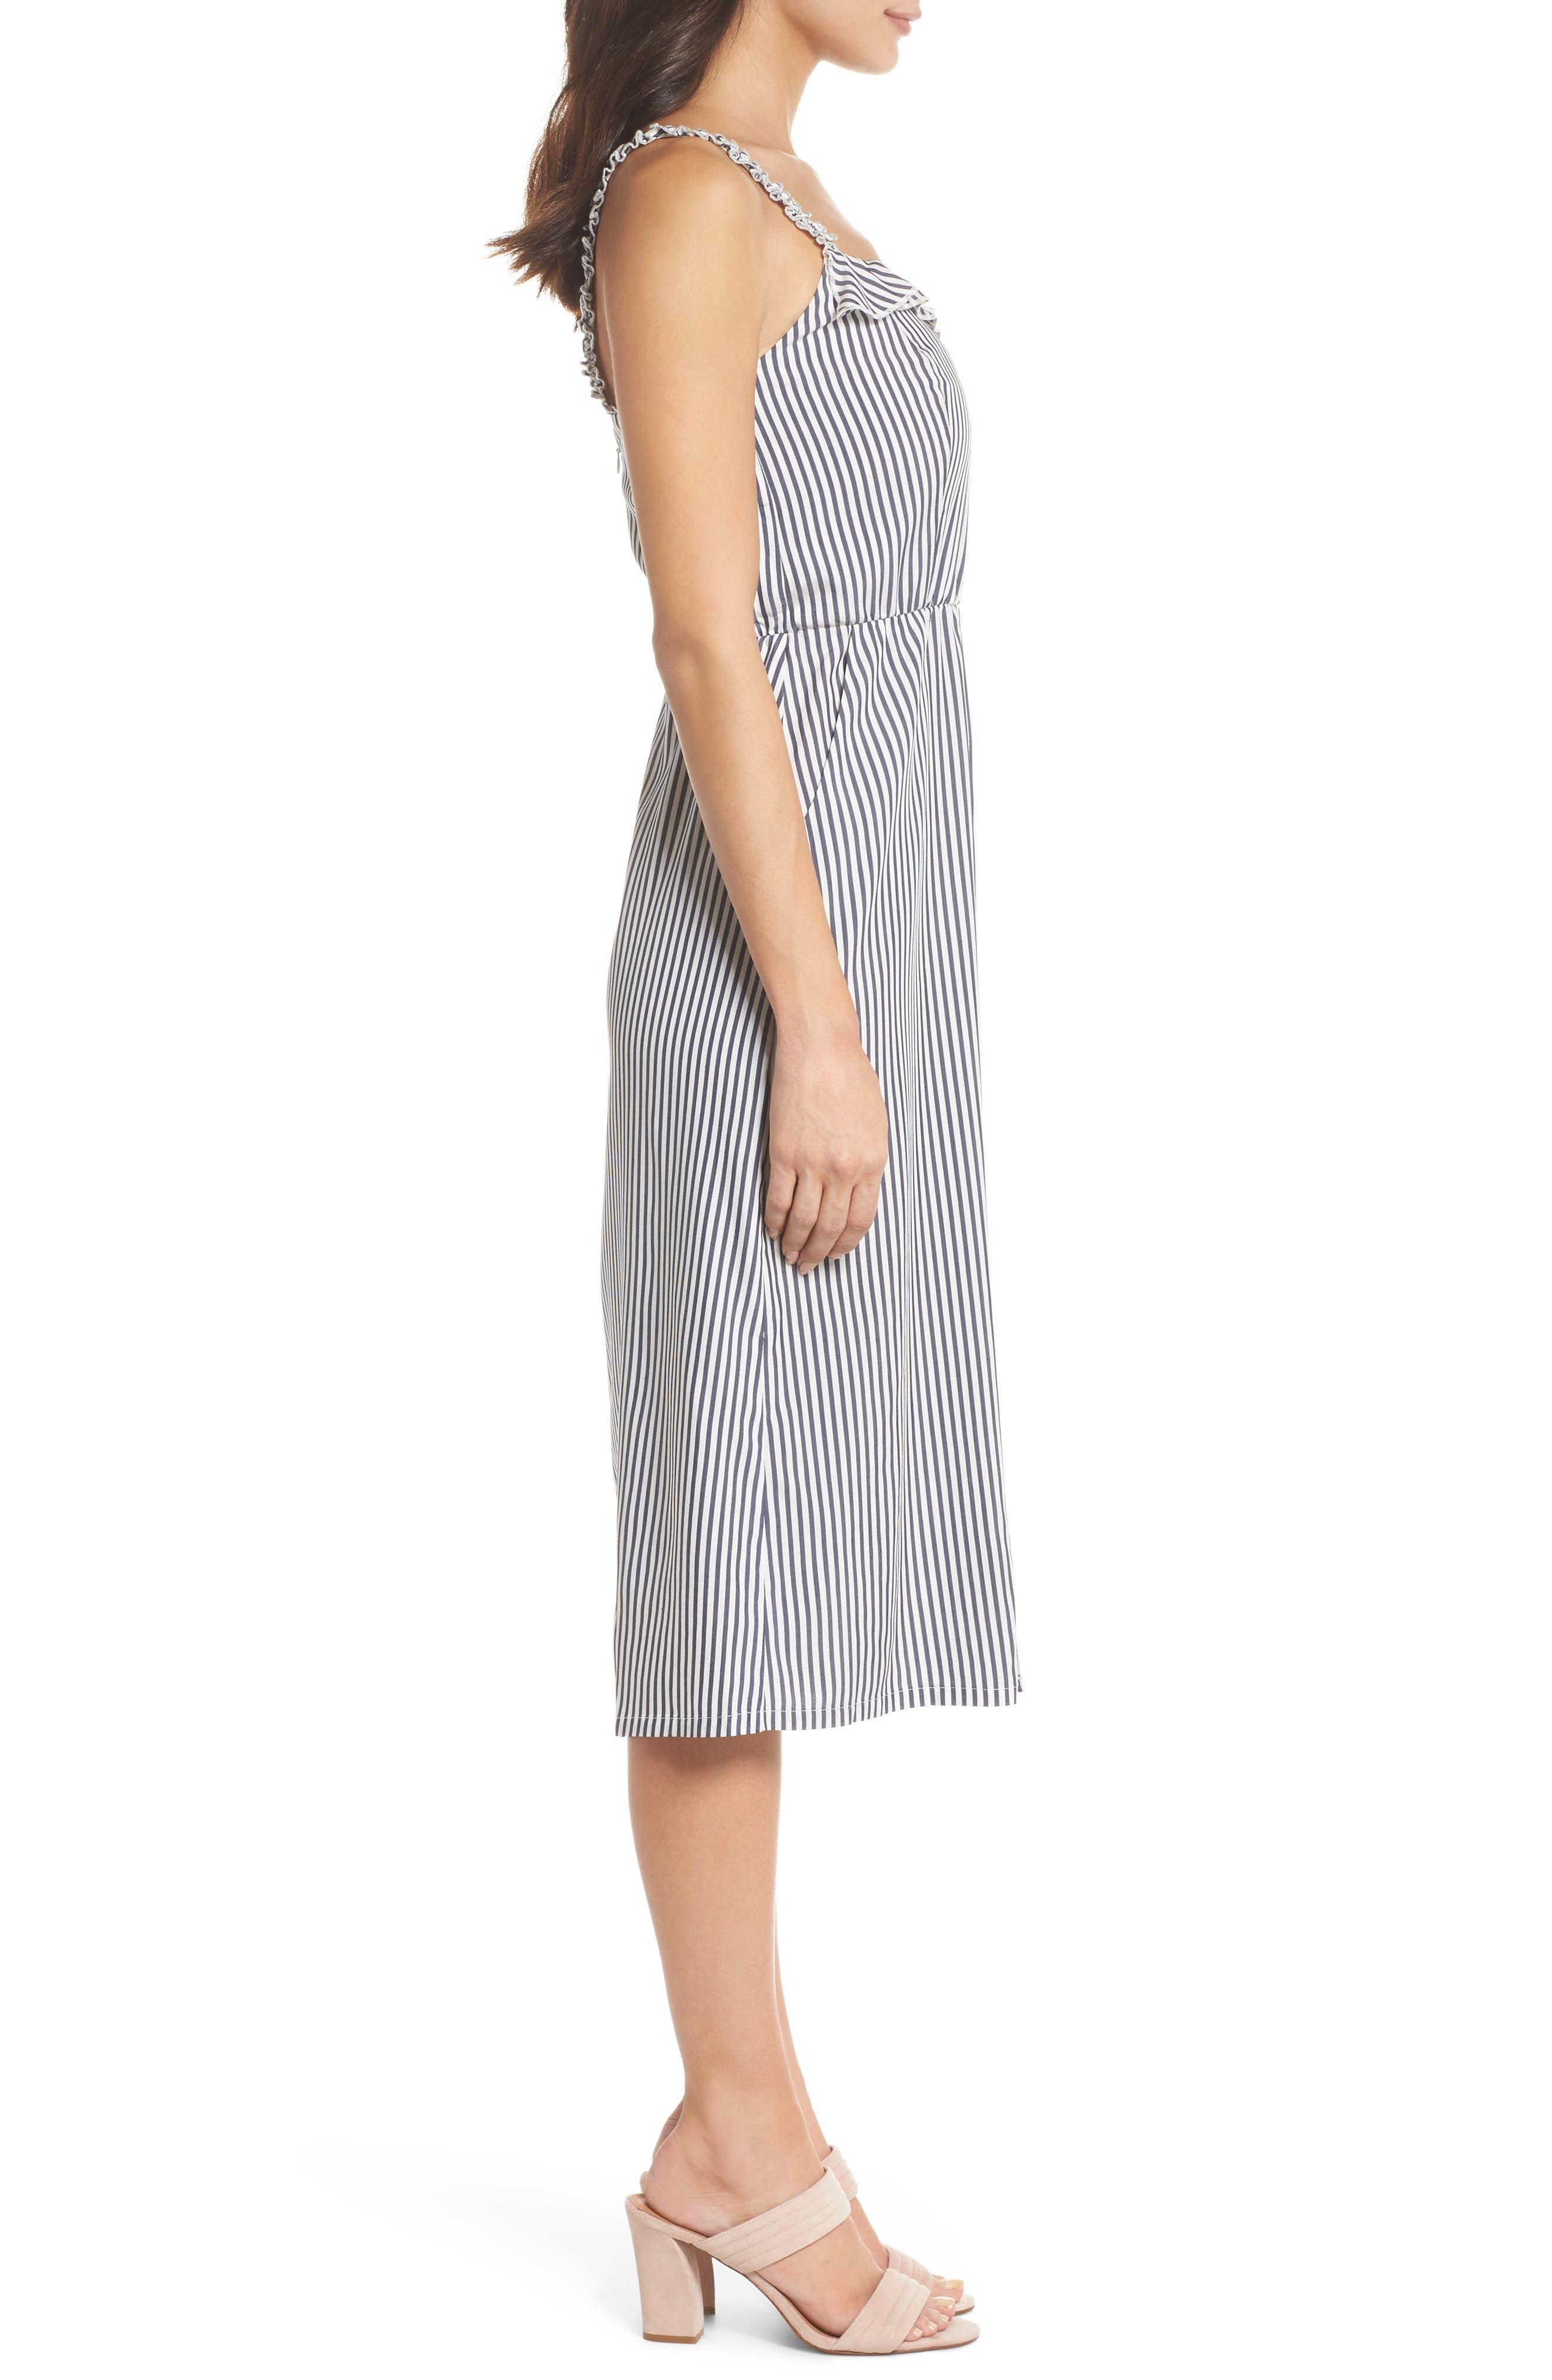 Drinks On Me Stripe Ruffle Midi Dress,                             Alternate thumbnail 3, color,                             Navy/ White Mini Stripe